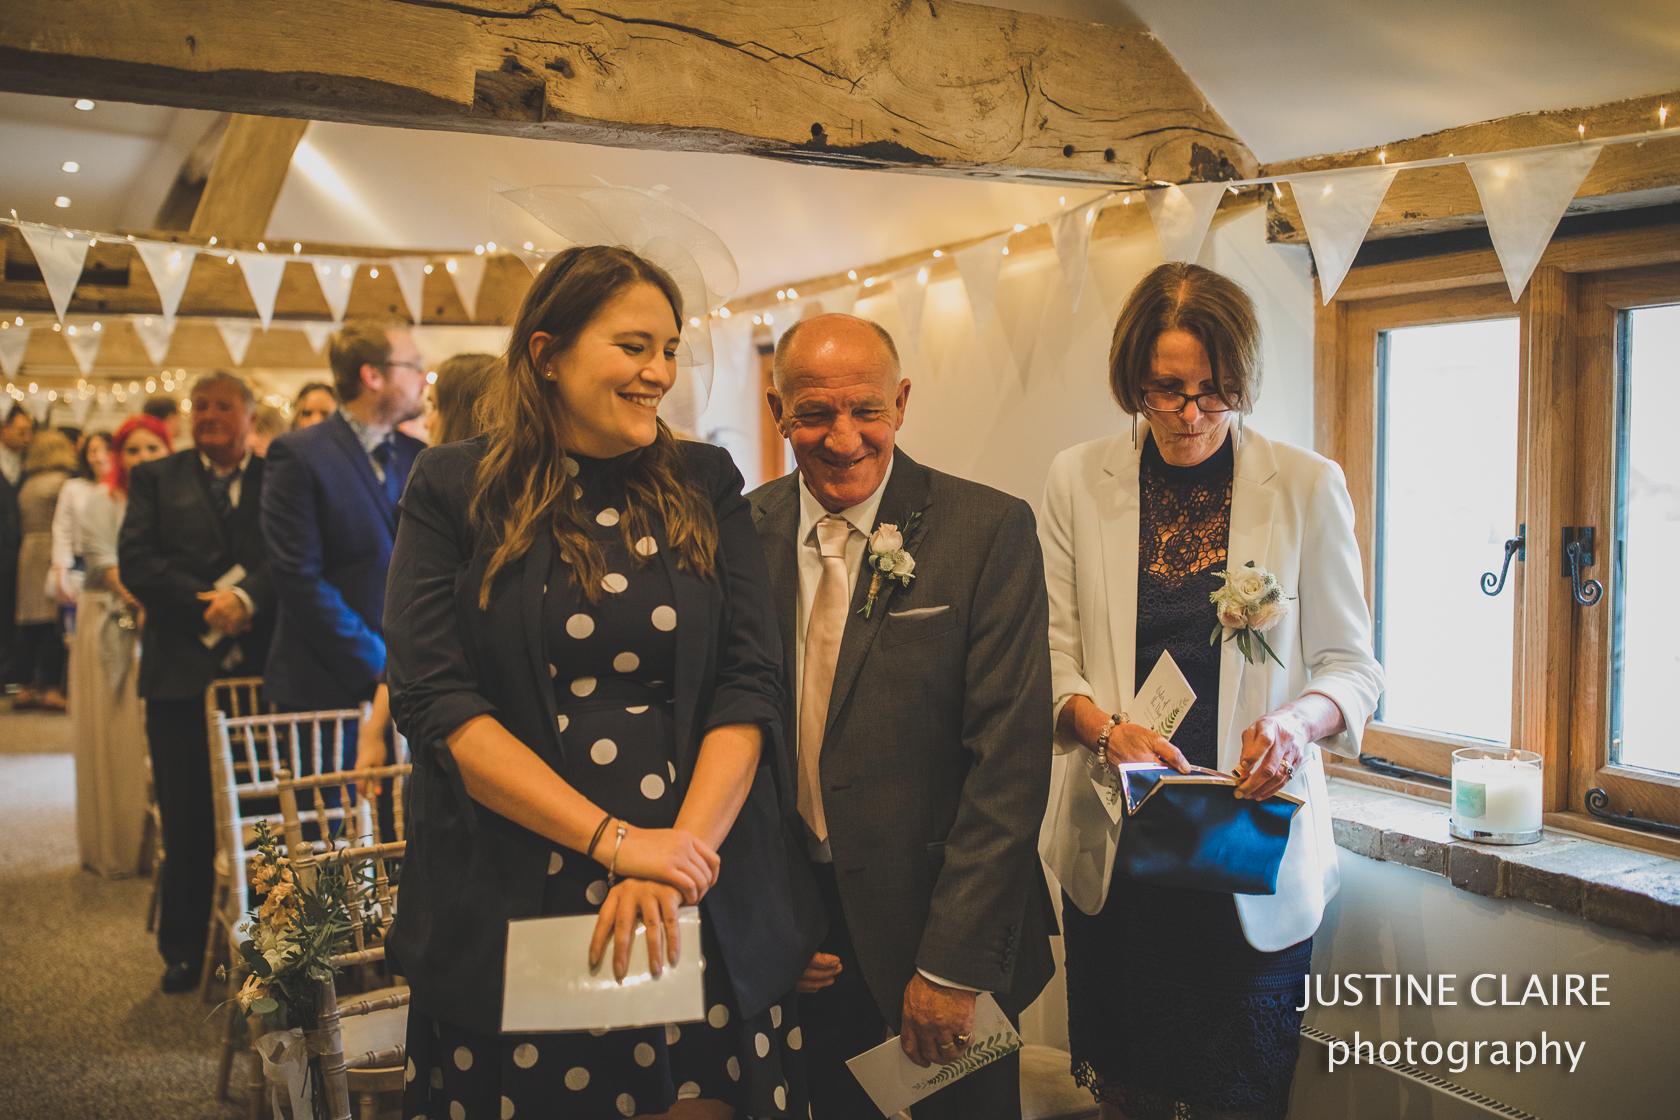 Fitzleroi Fittleworth petworth Billingshurst farm Wedding Photography by Justine Claire photographer Arundel Worthing Brighton-16.jpg